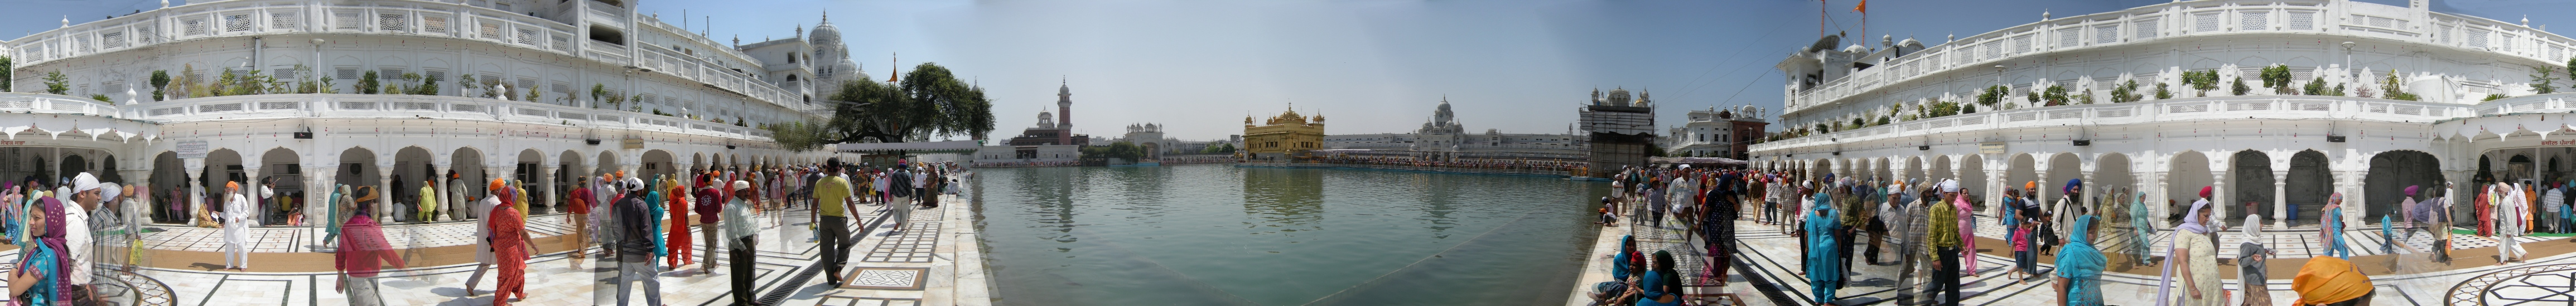 Sergej Marsnjak - India (North) - Amritsar - Golden temple - Panorama